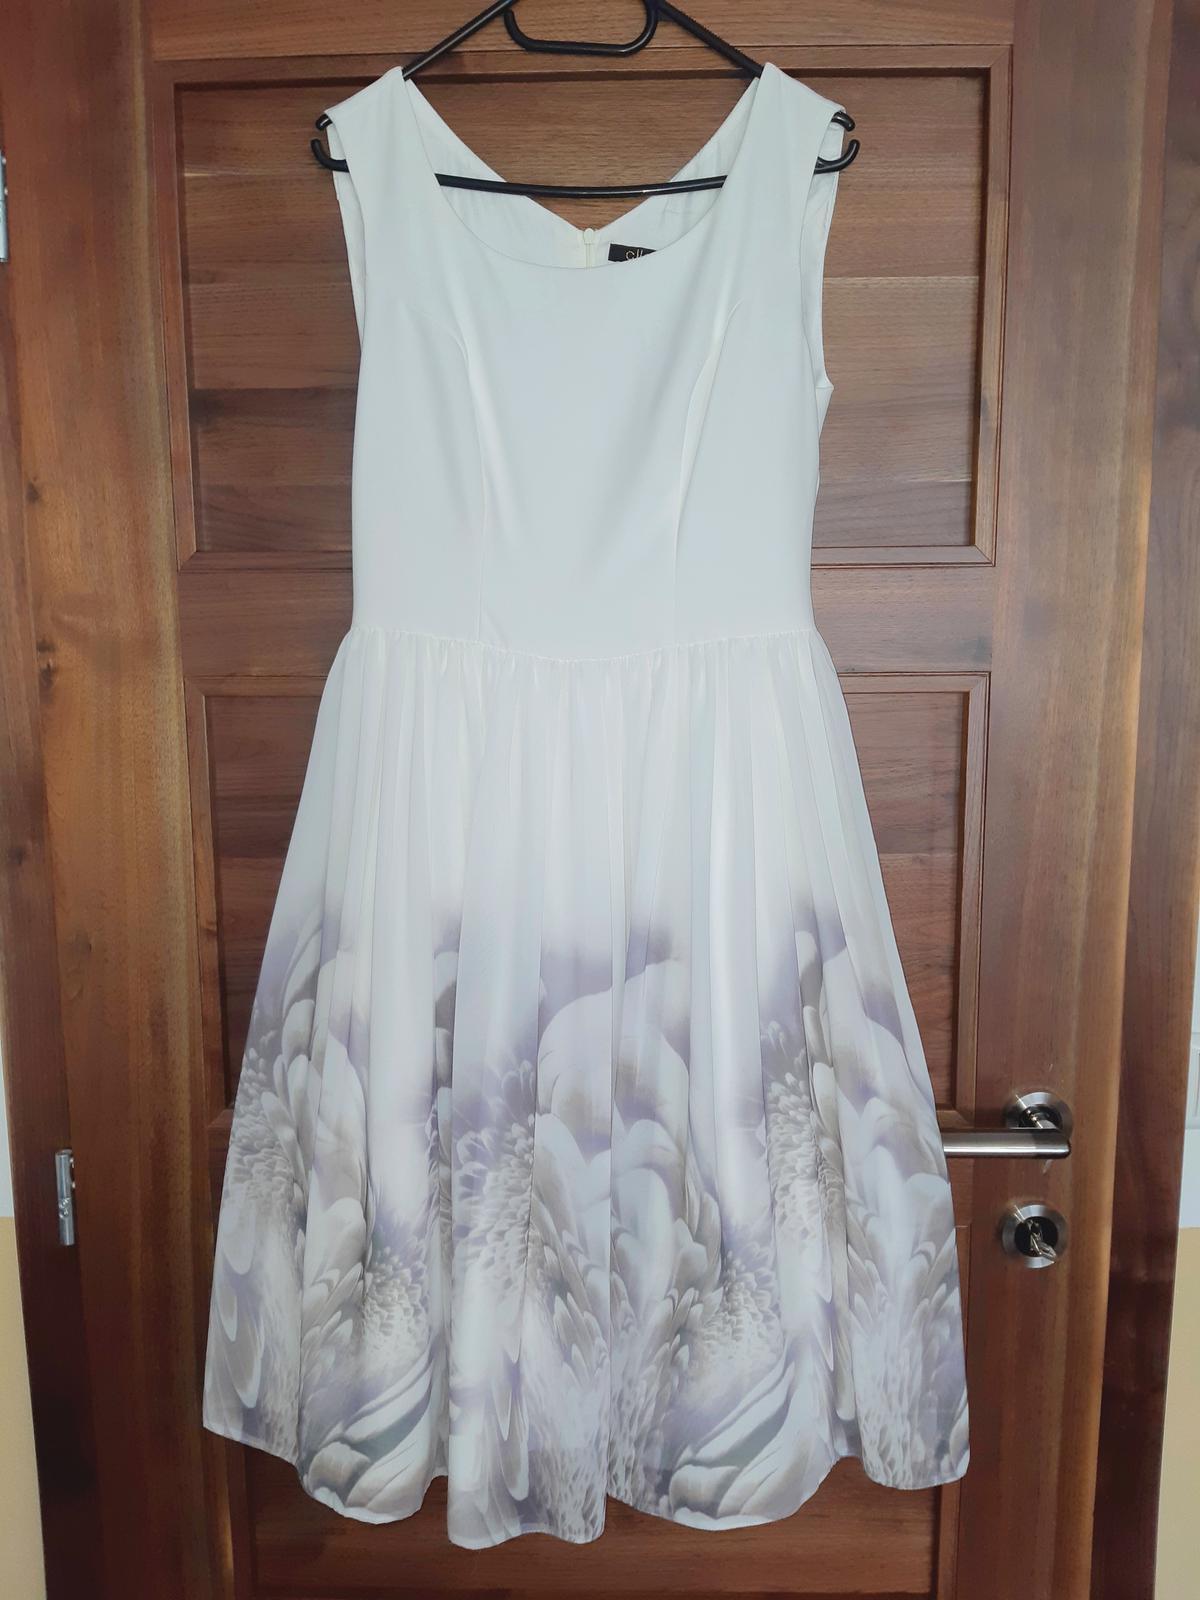 Biele šaty s fialkovými kvetmi - Obrázok č. 4